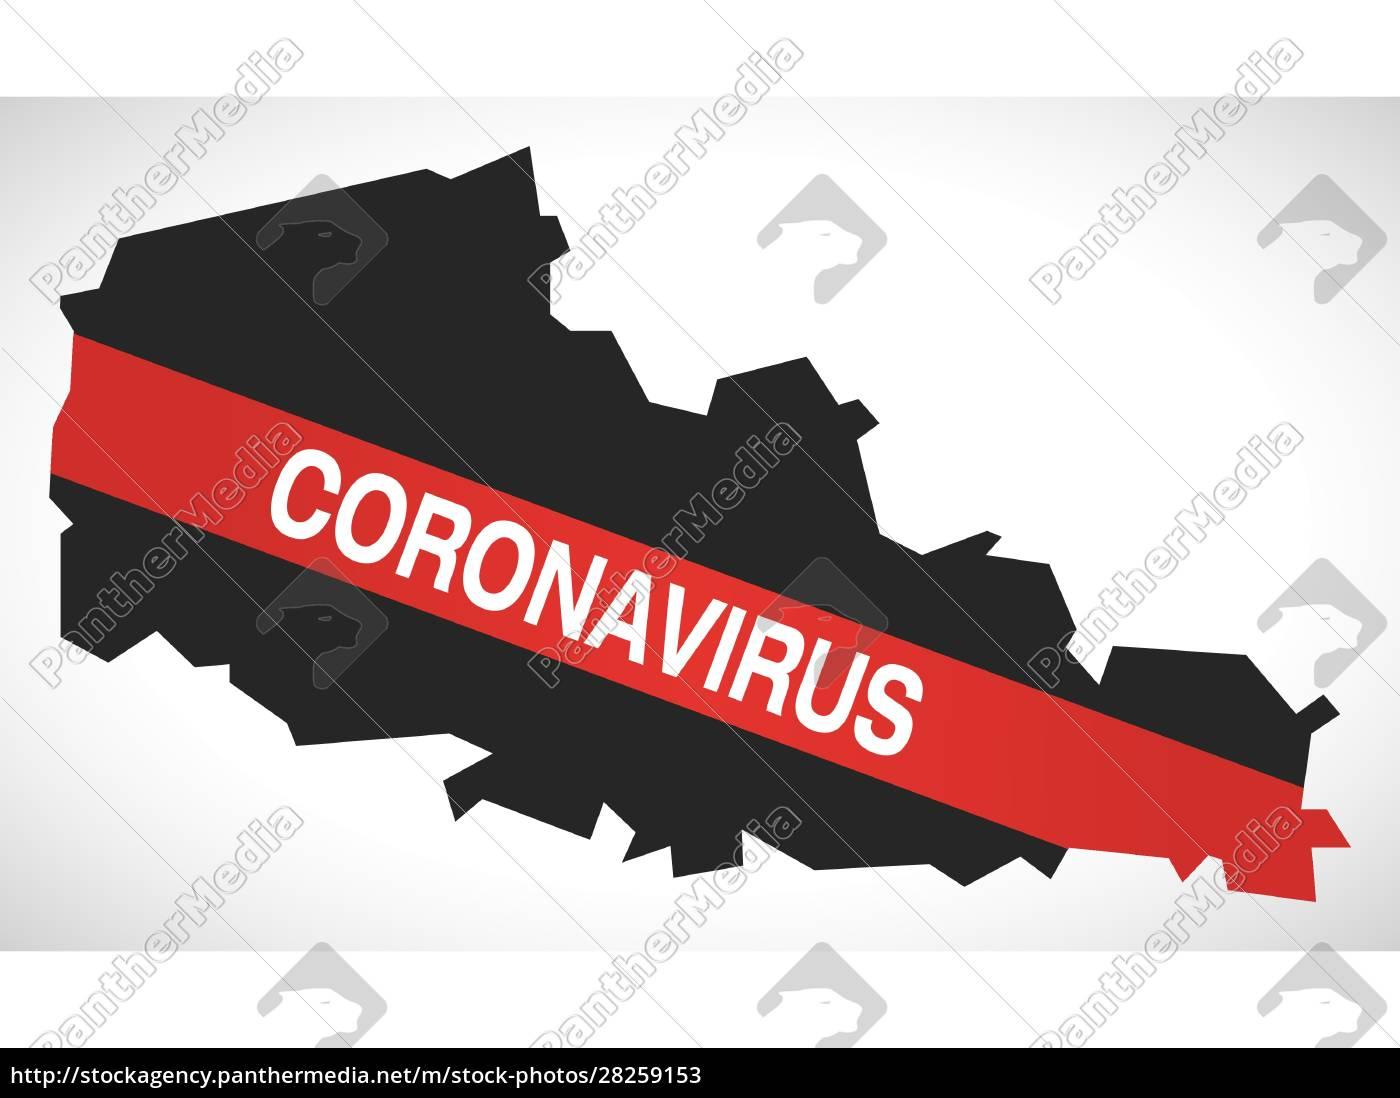 nord-pas-de-calais, france, region, map, with, coronavirus - 28259153